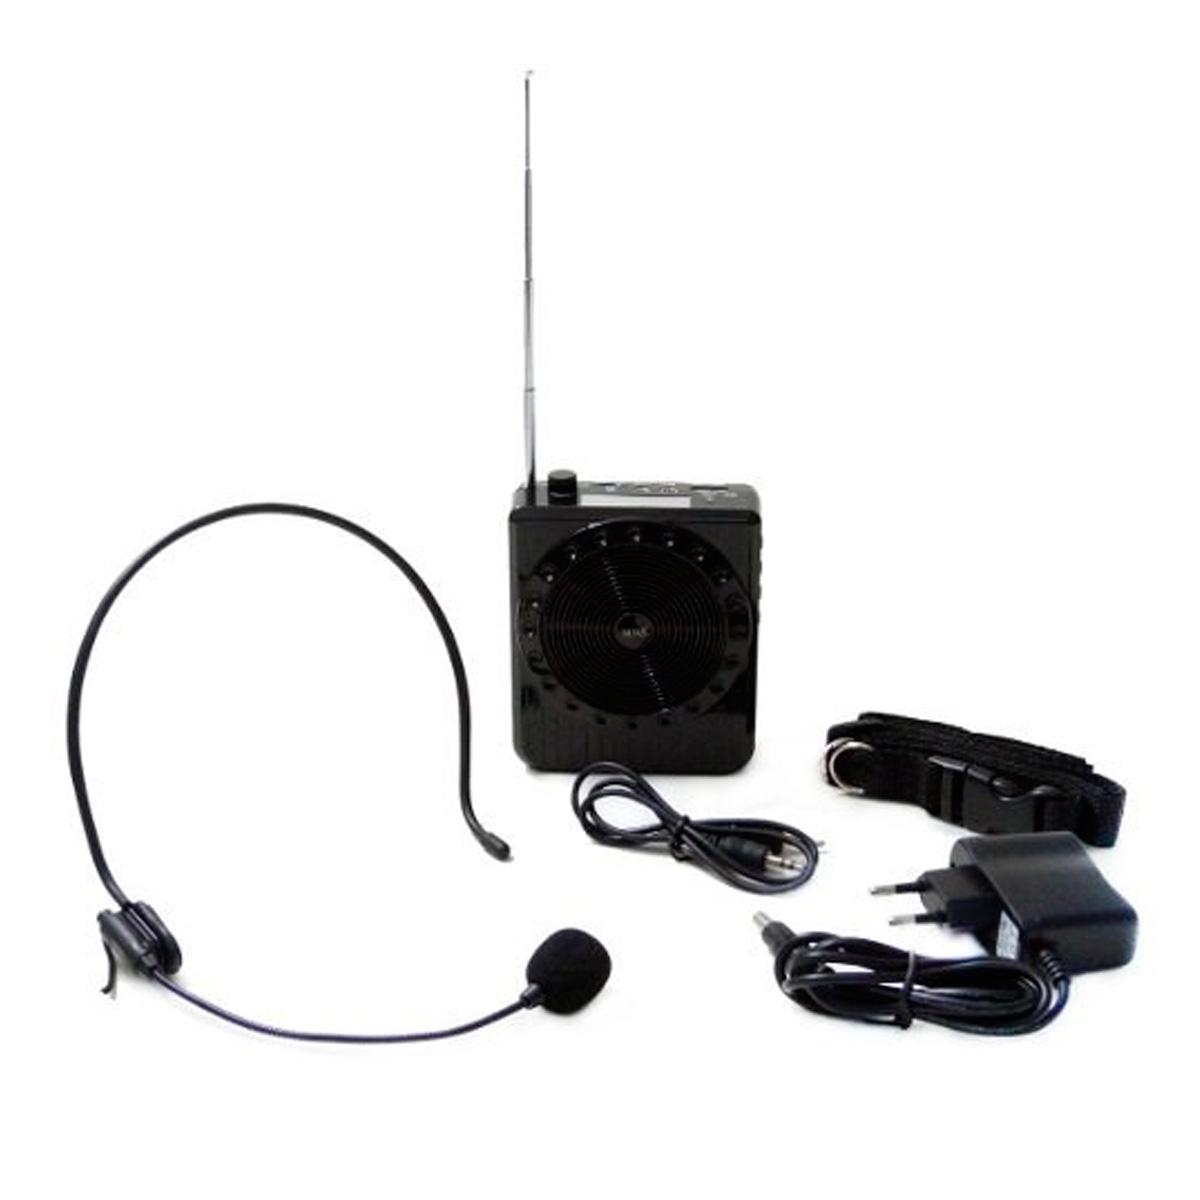 BQ810 - Kit Professor Portátil c/ Caixa + Microfone c/ Fio BQ 810 Preto - Boas